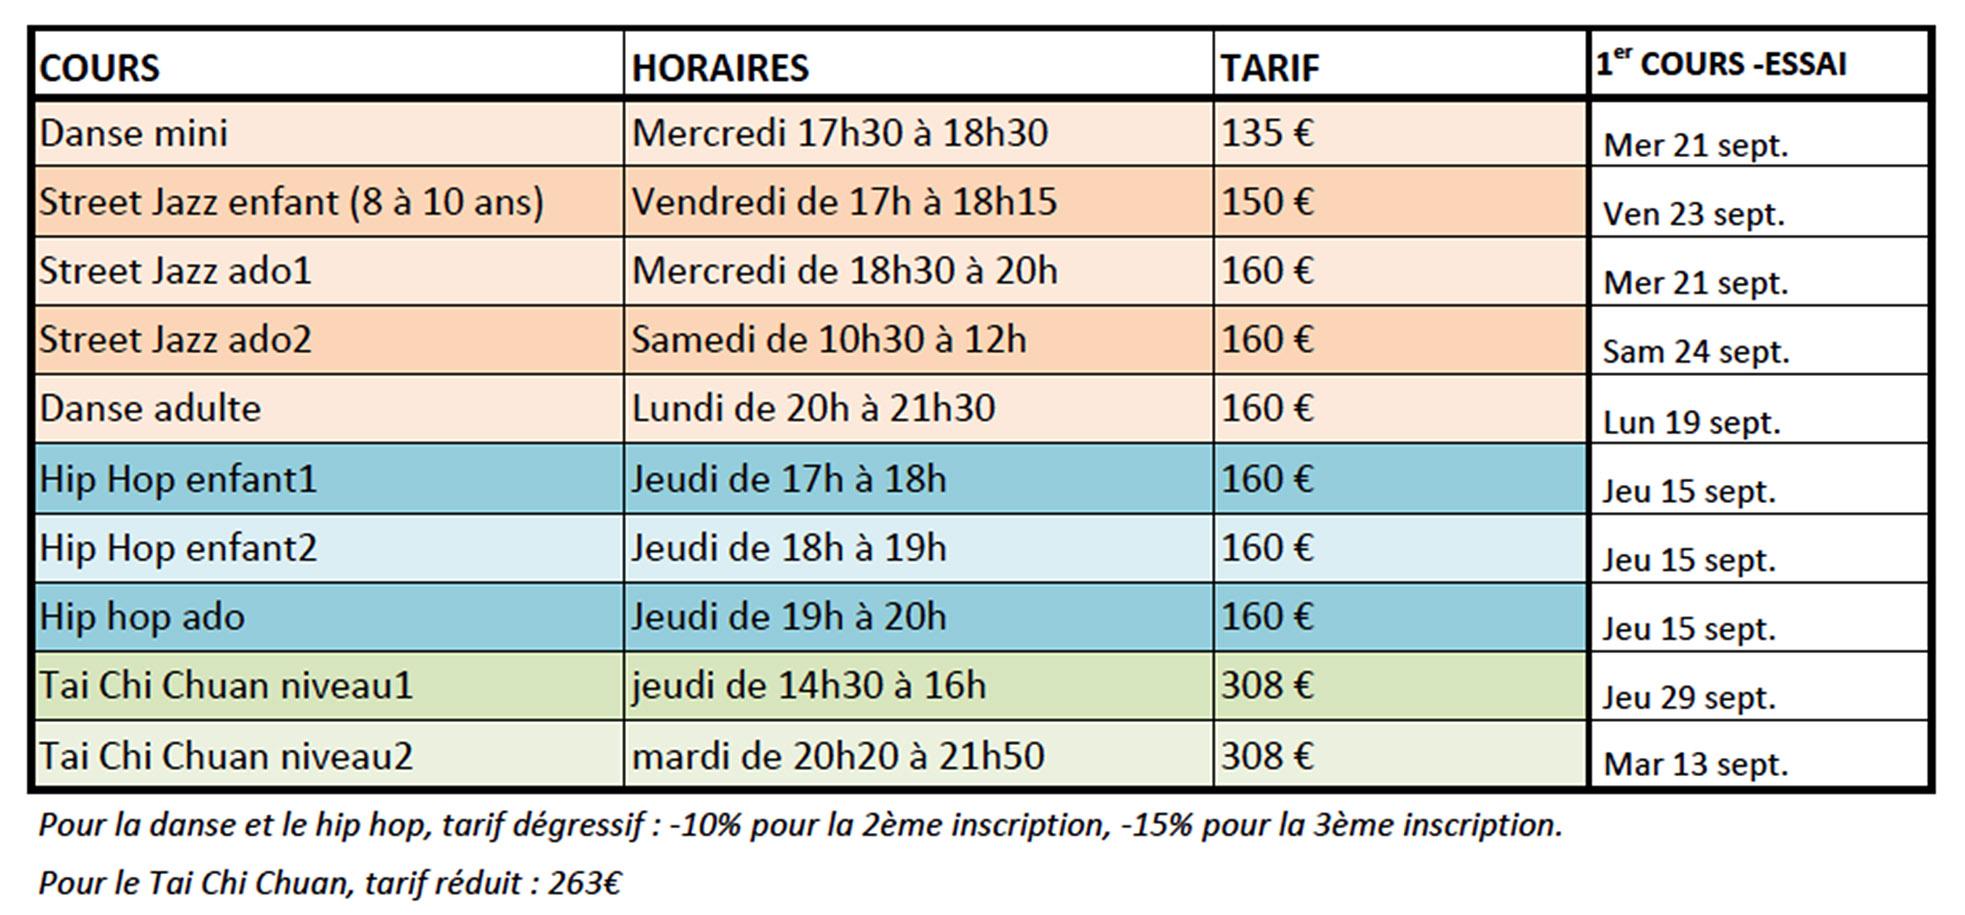 Horaires et tarifs